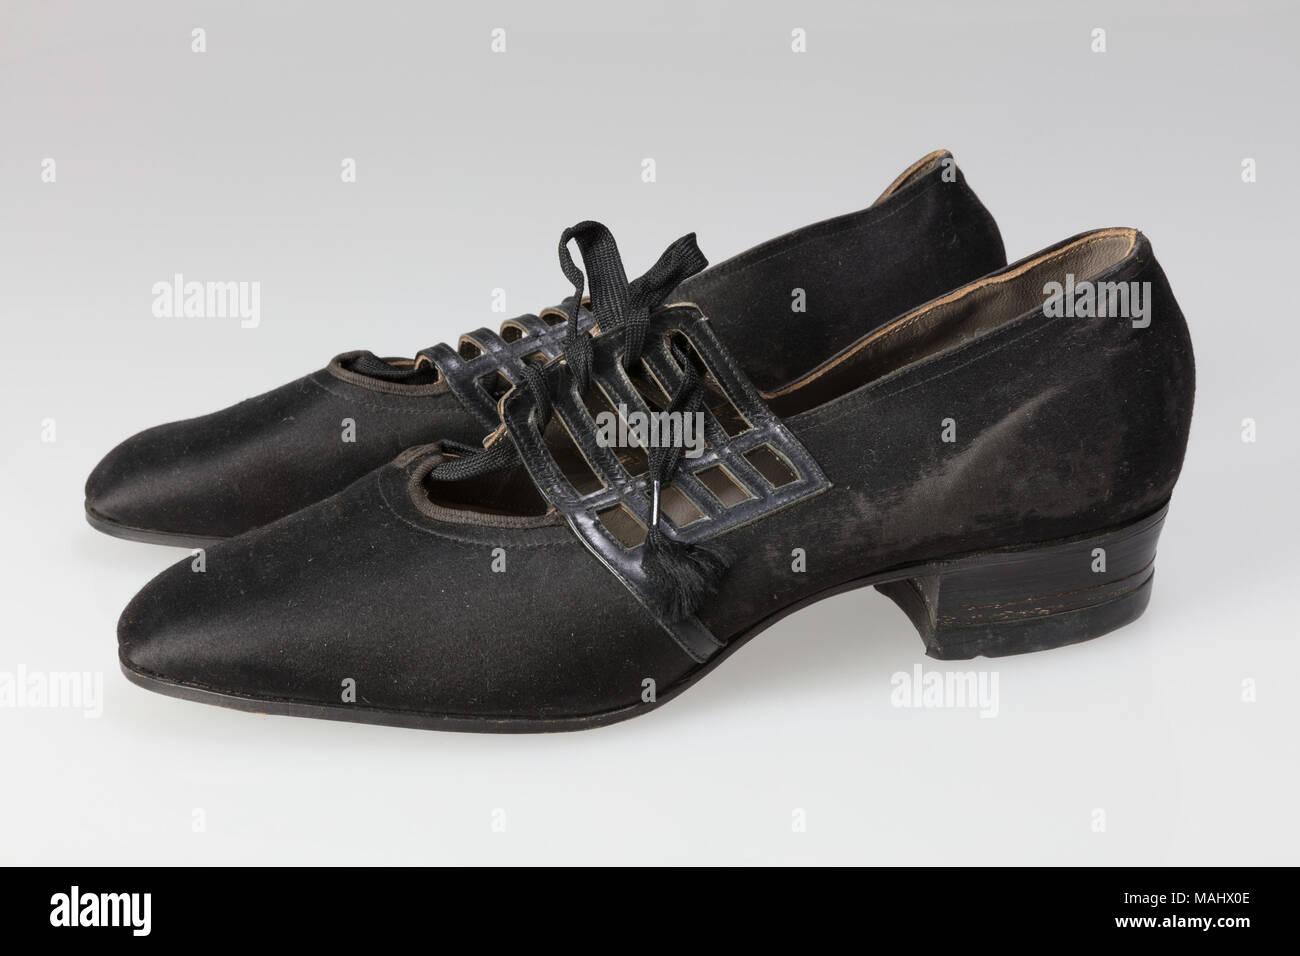 Diamond Shoe Weatherbird Peters Women's Shoes Black Brand Company x8ETUHU